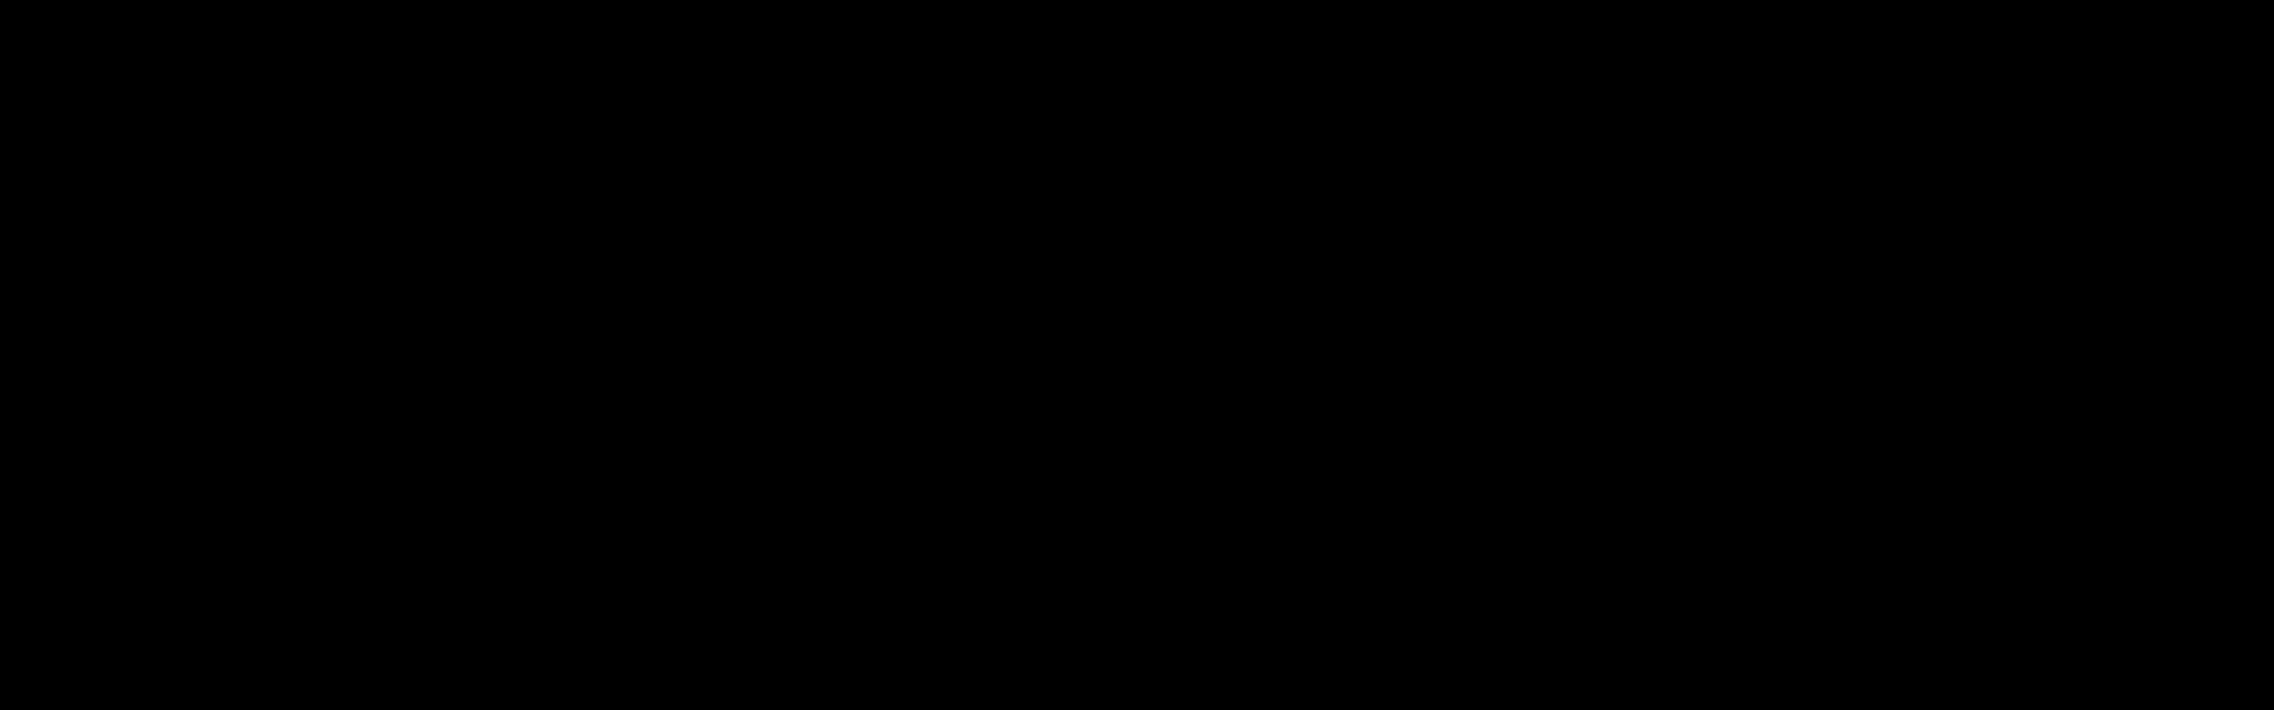 N-Hydroxy-3-[4-(dansyl-<sup>13</sup>C<sub>2</sub>-amino)phenyl]acrylamide